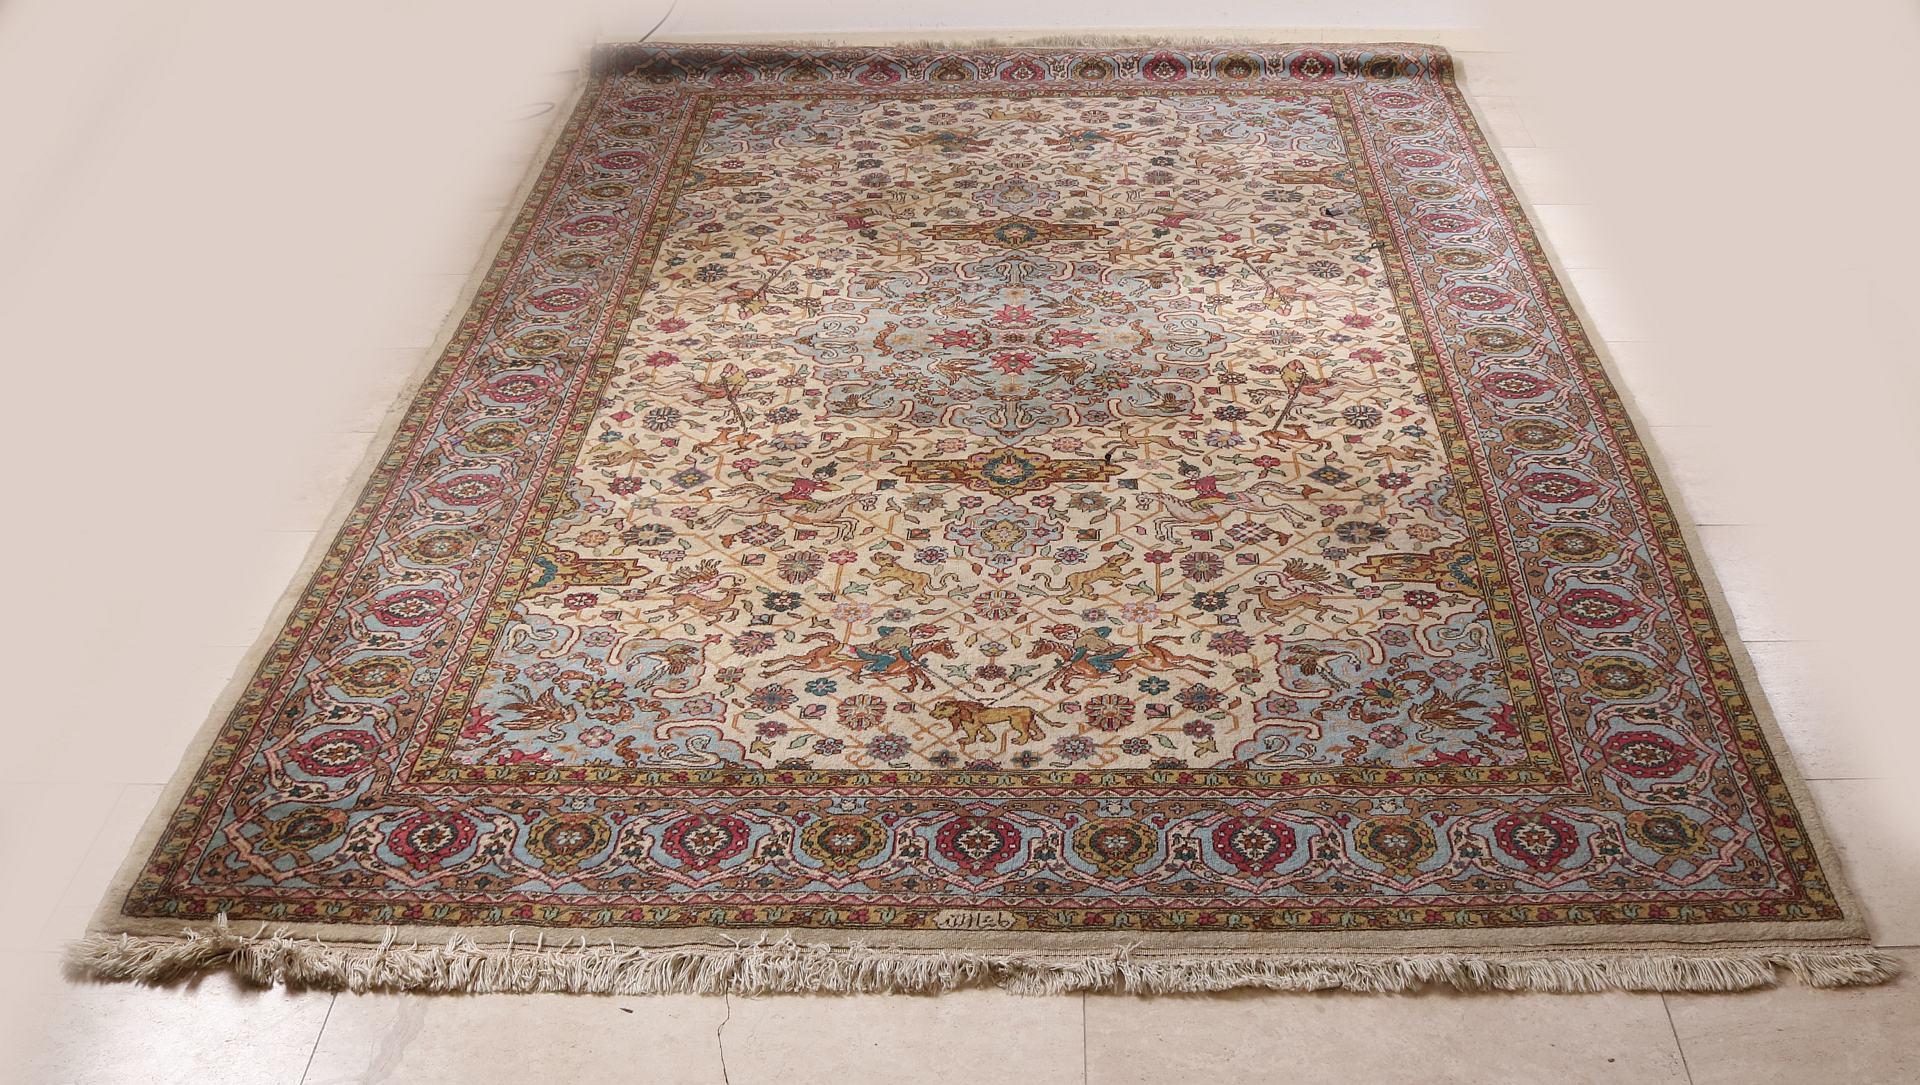 Perzisch tapijt, 310 x 210 cm